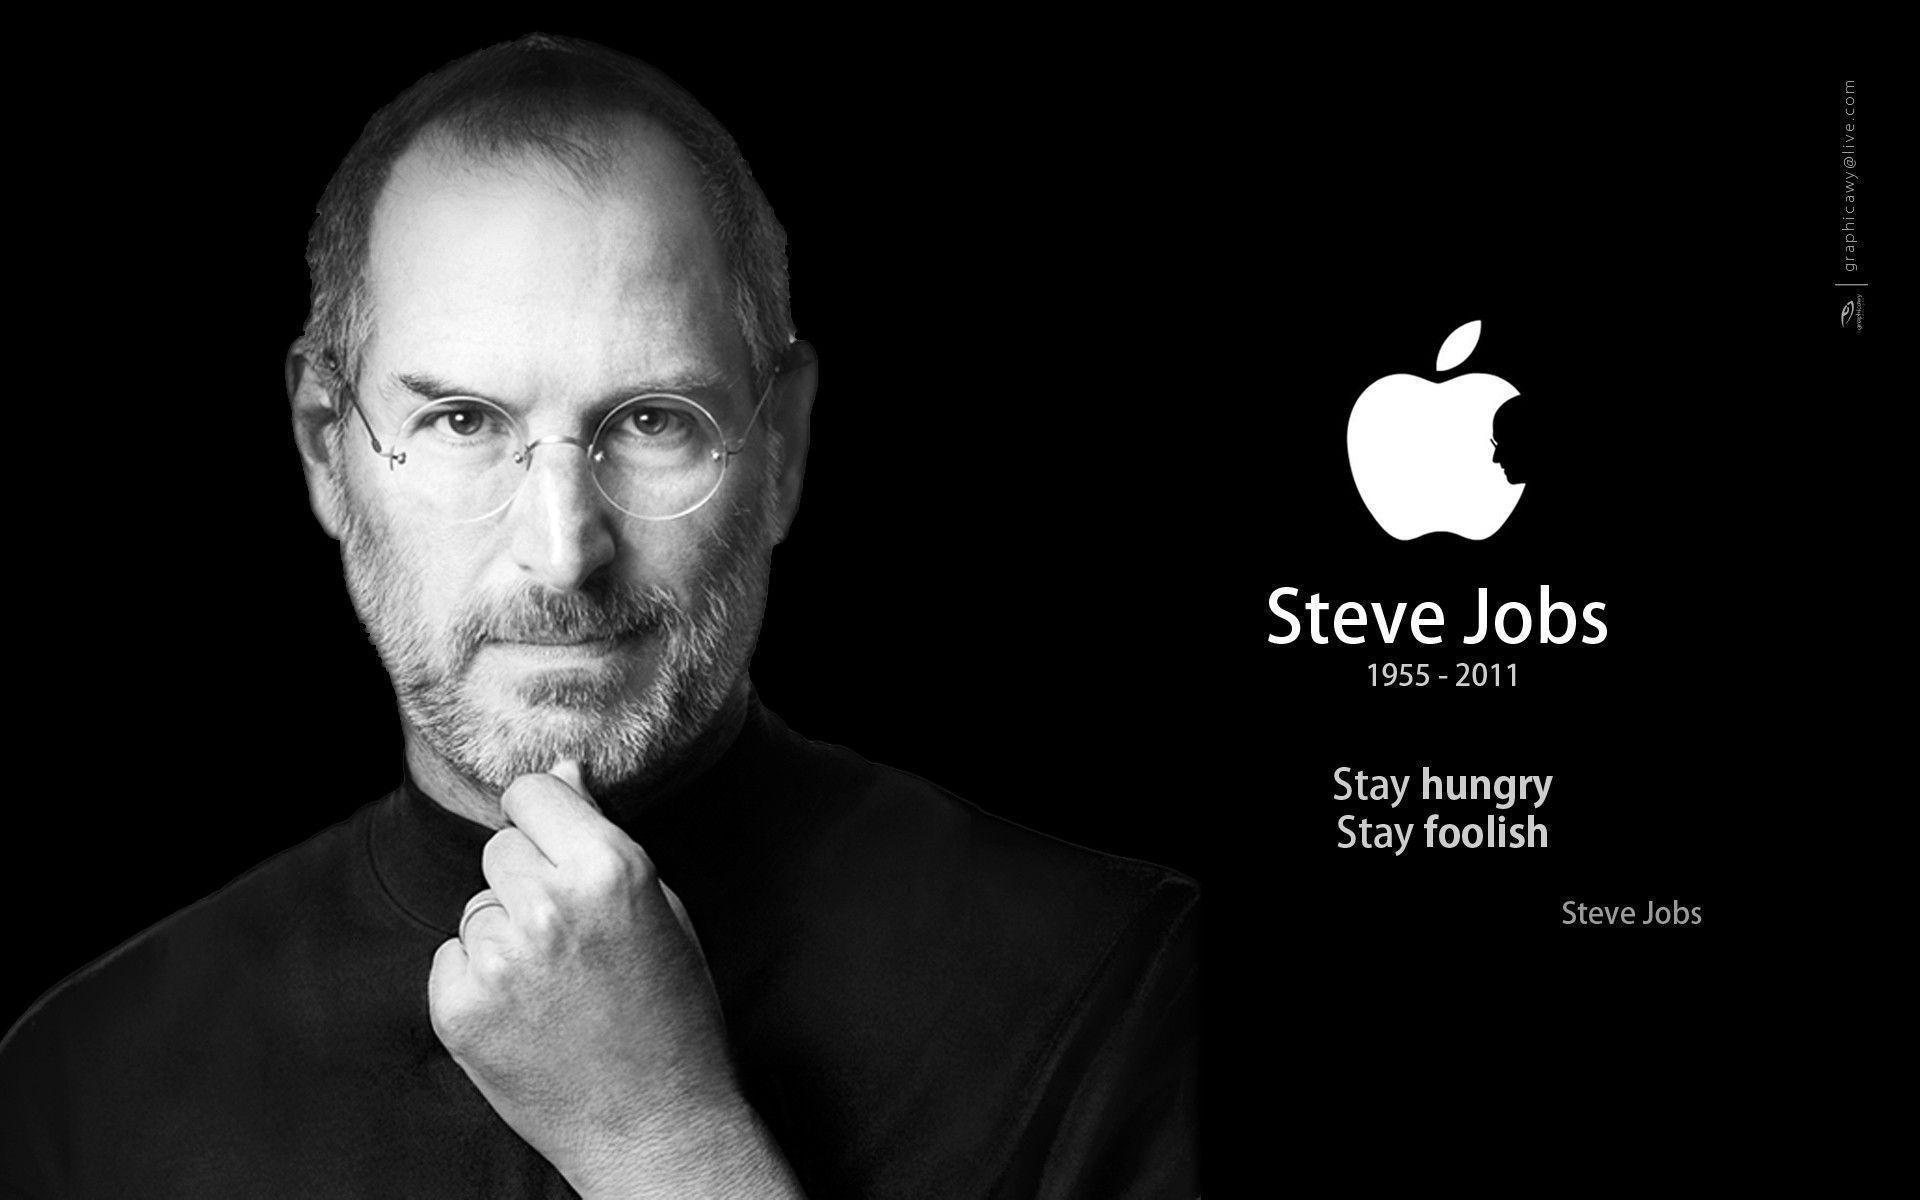 Steve Jobs Wallpapers Top Free Steve Jobs Backgrounds